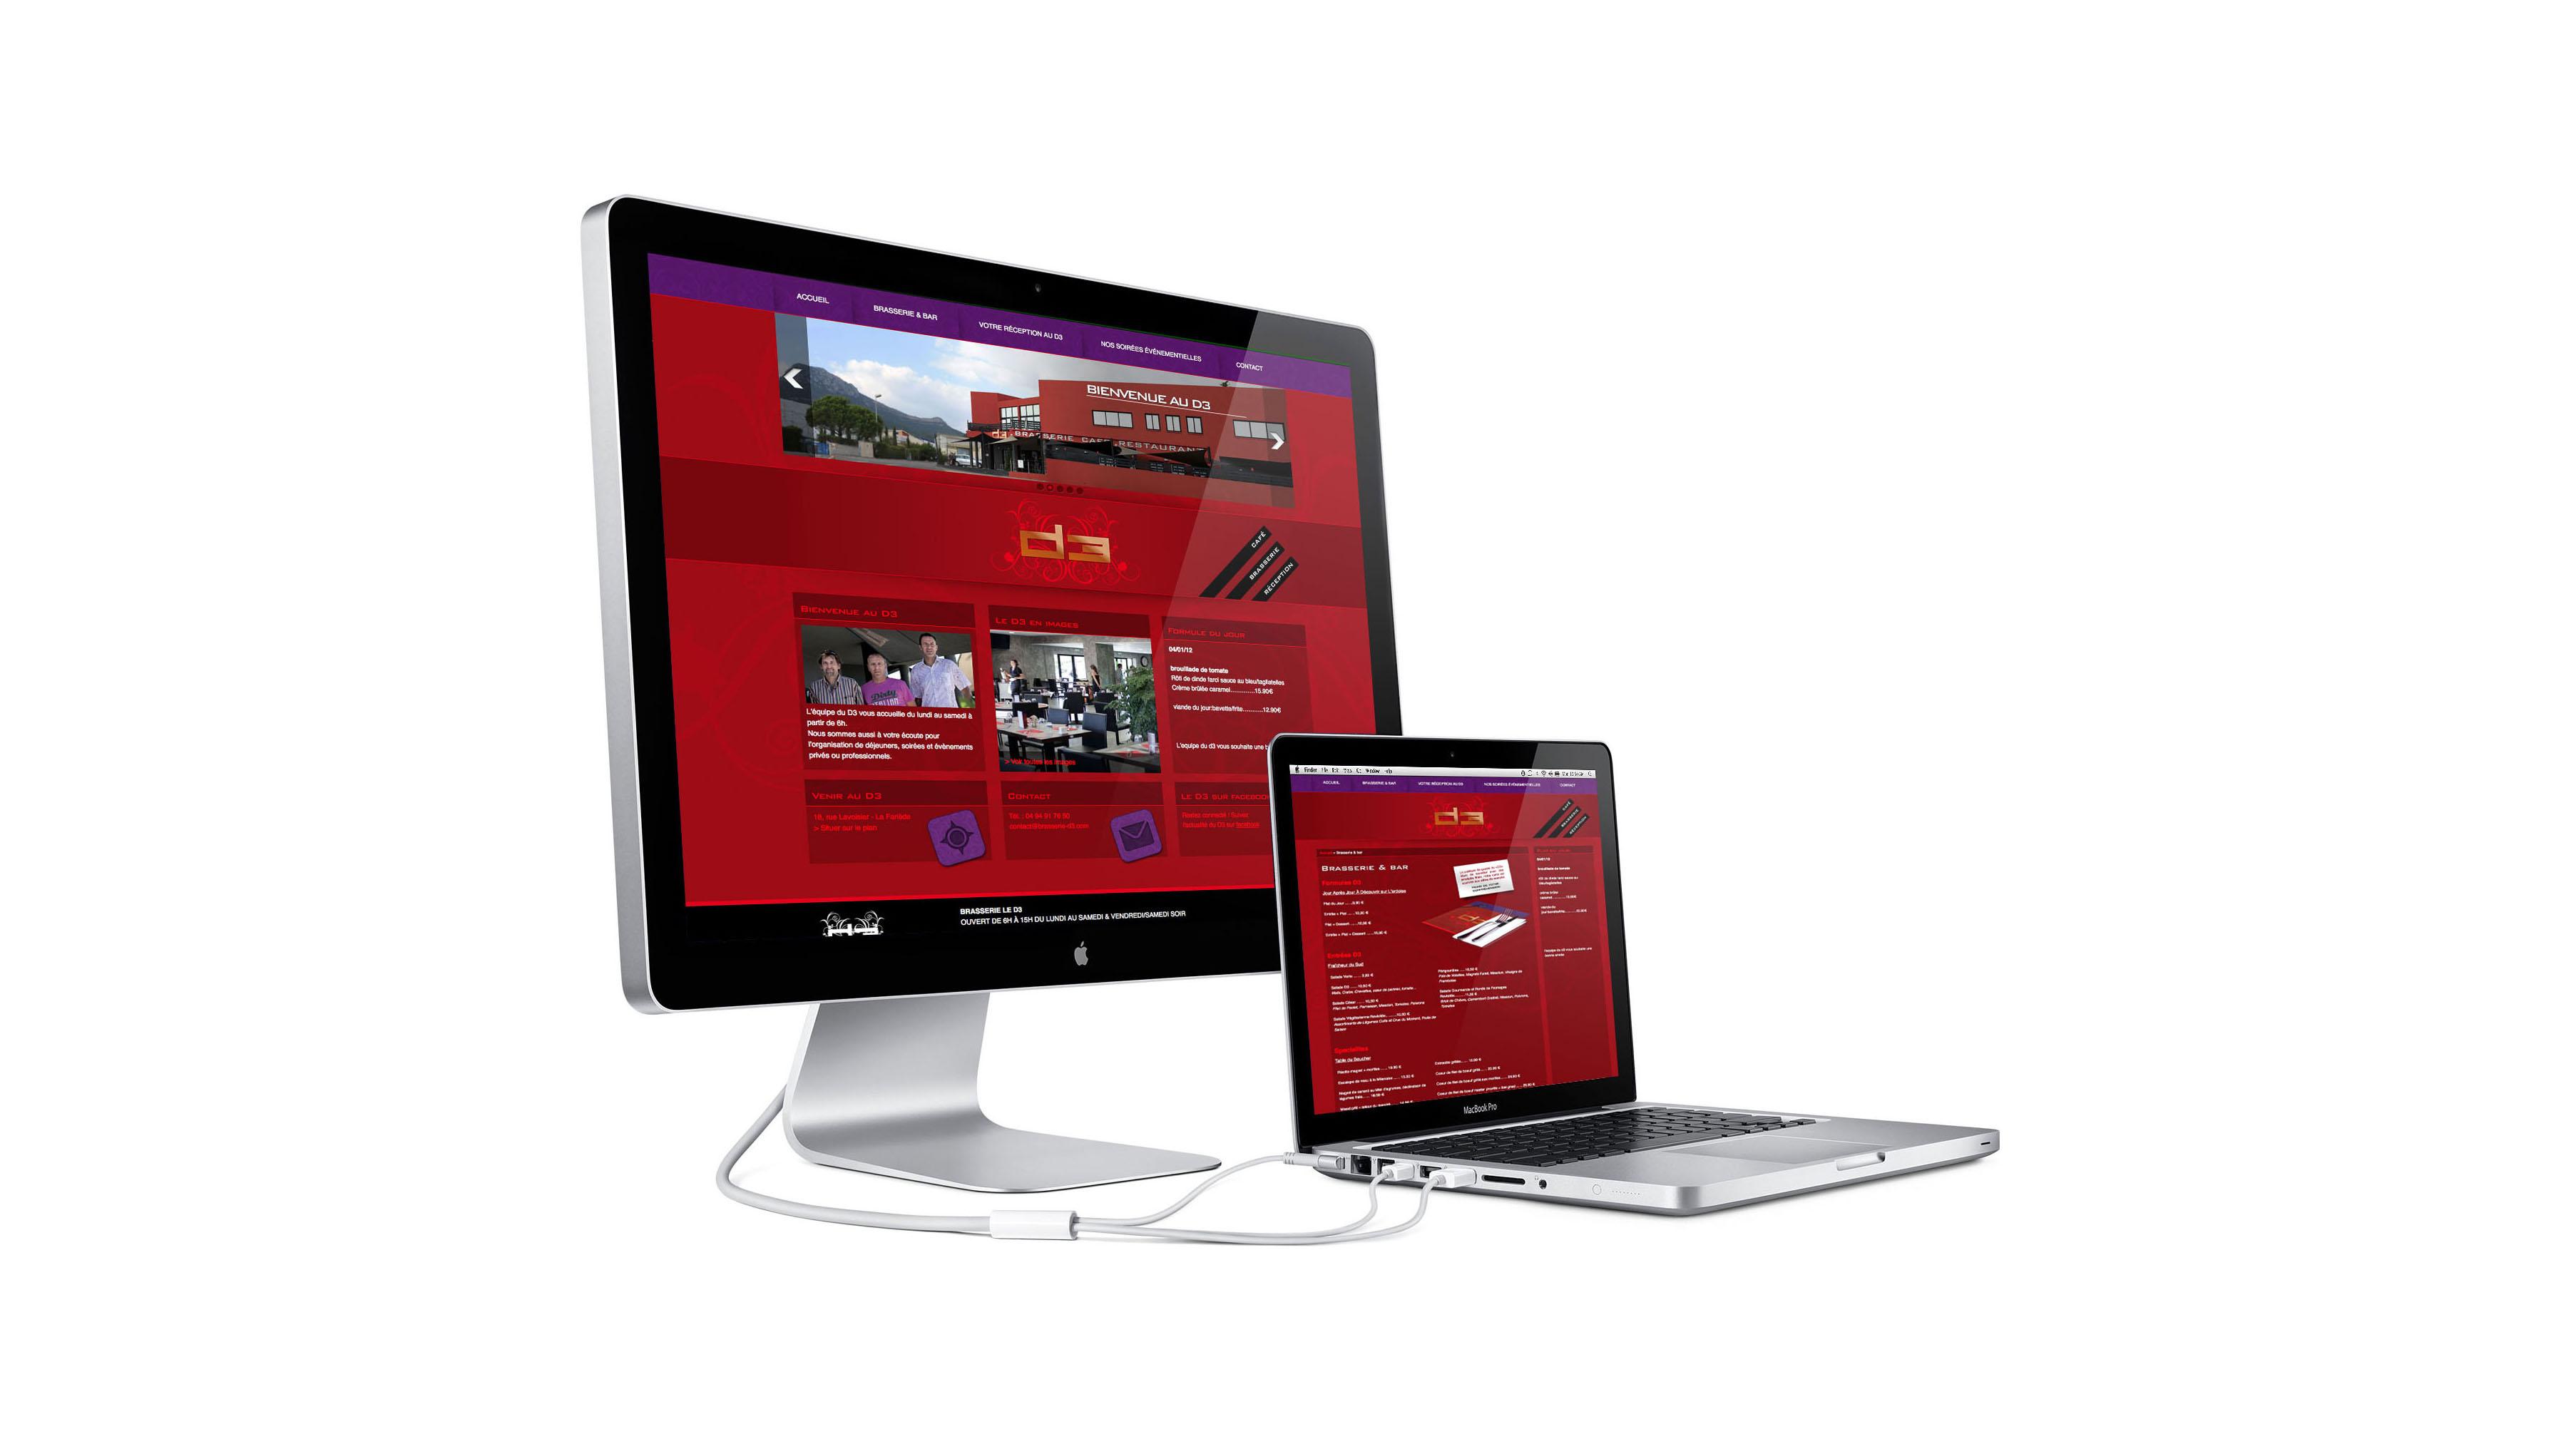 d3-ecran-portable.jpg